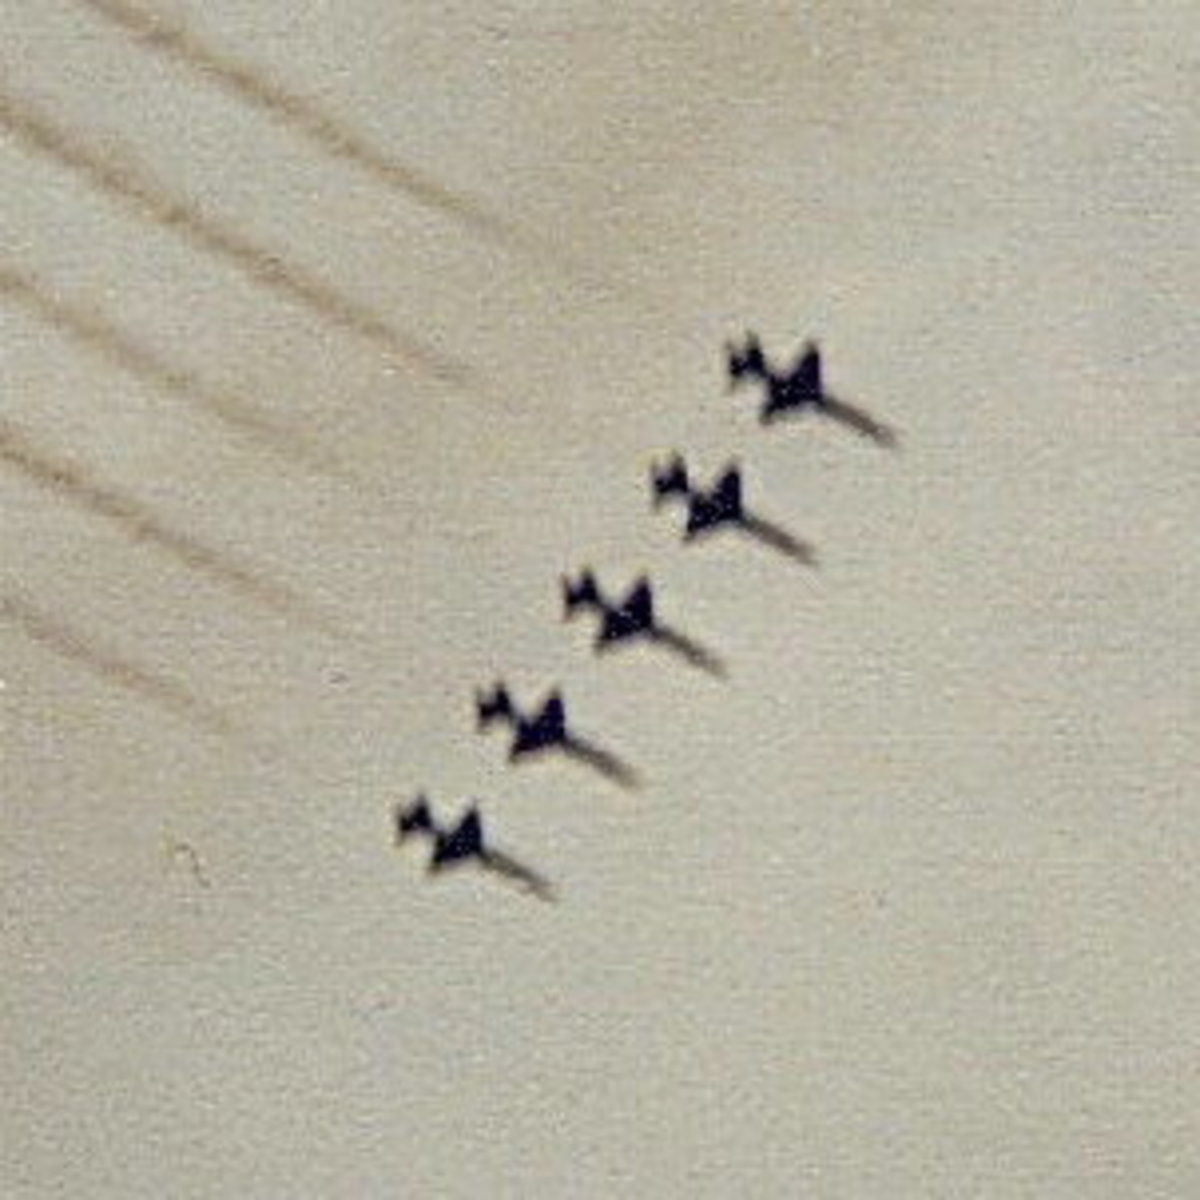 USAF Thunderbirds in T-38s, Randolph AFB, TX, circa 1980.